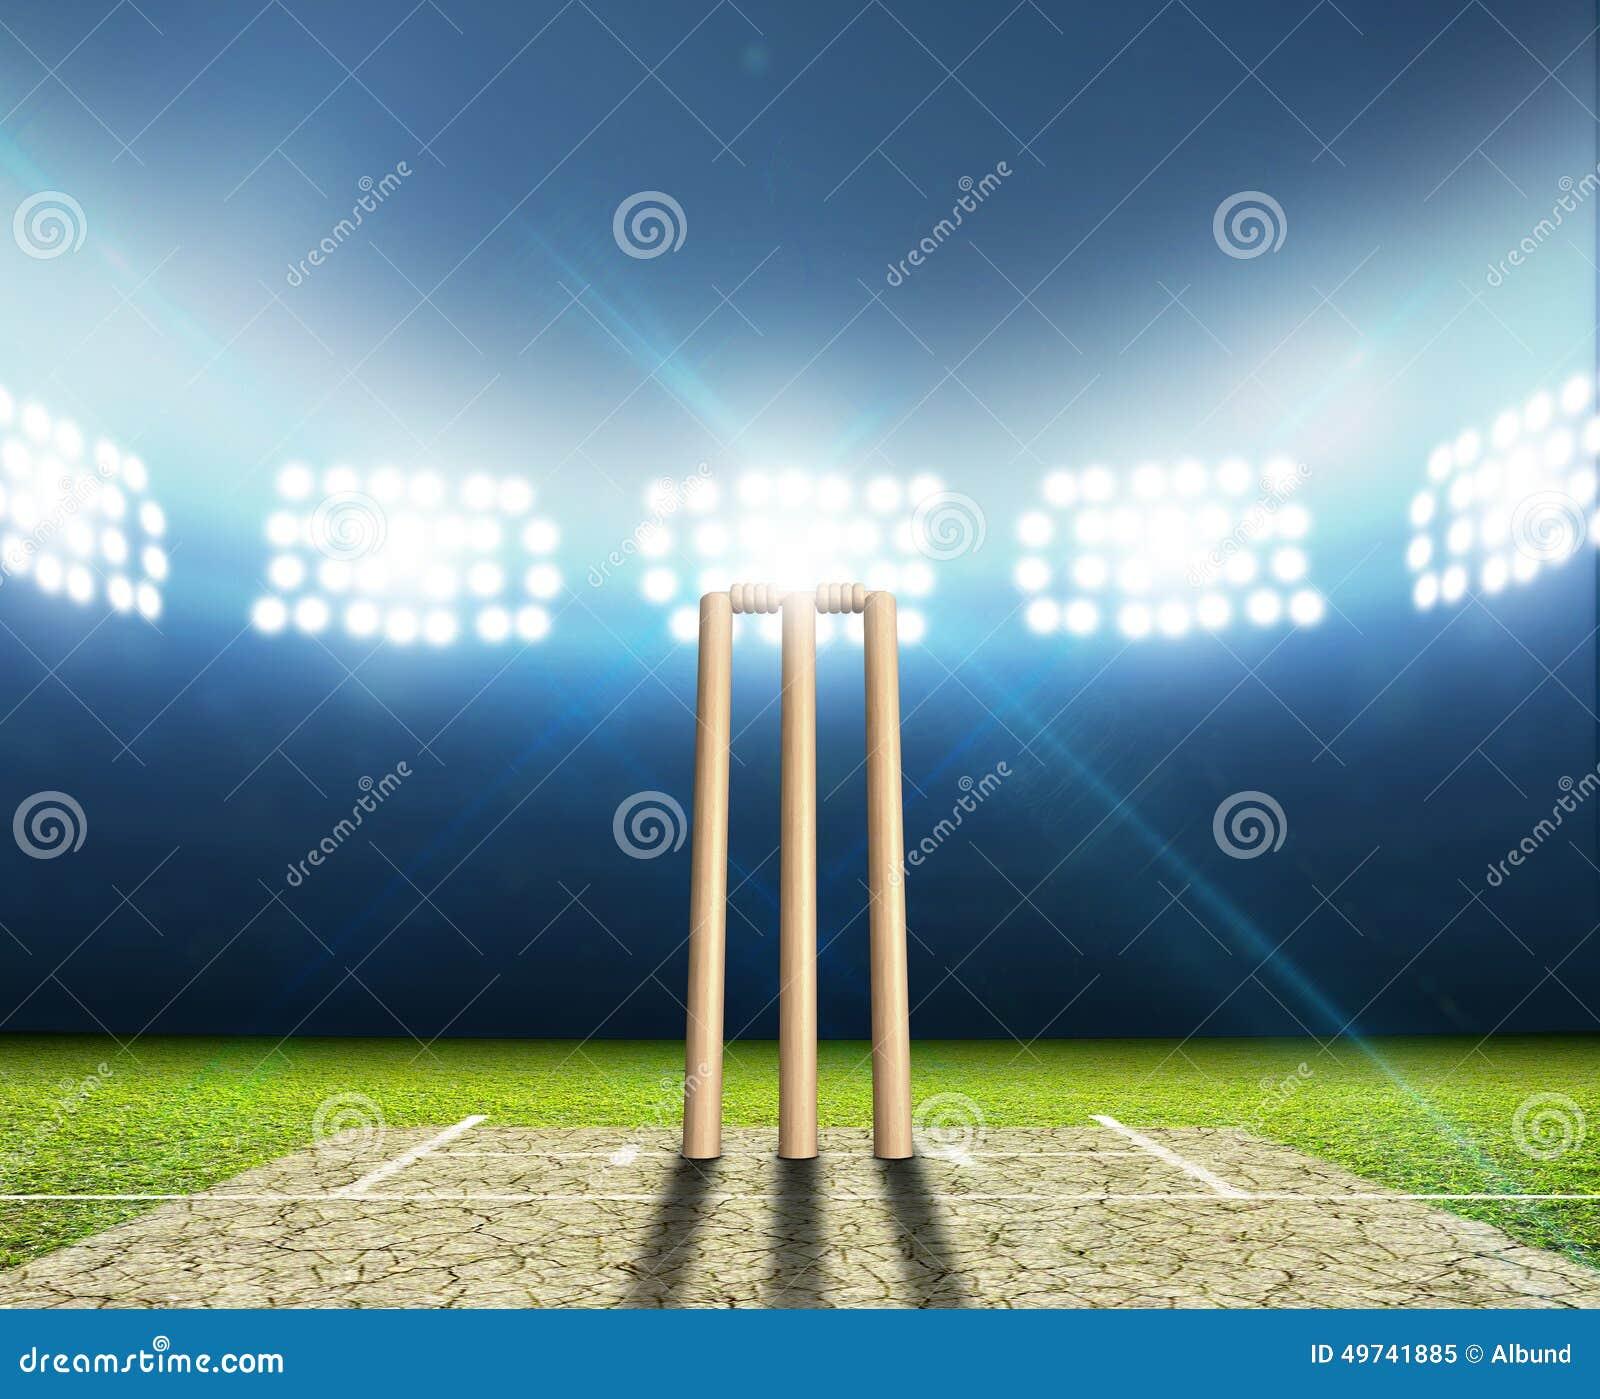 Stadium Lights Svg: Cricket Stadium And Wickets Stock Illustration